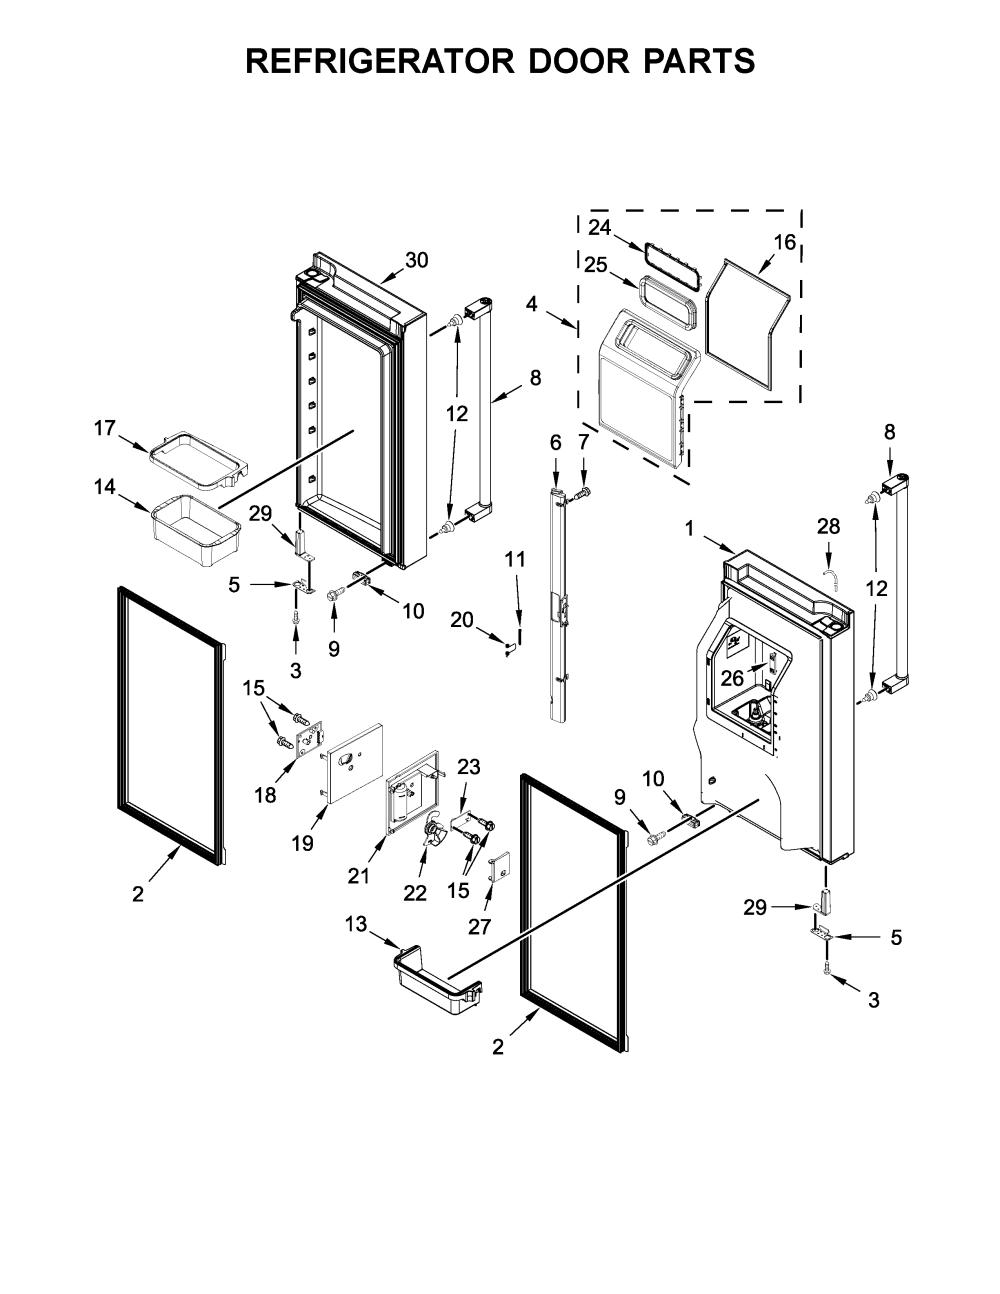 medium resolution of looking for kitchenaid model krmf706ess01 bottom mount refrigerator diagram also kitchenaid refrigerator parts diagram as well kitchenaid